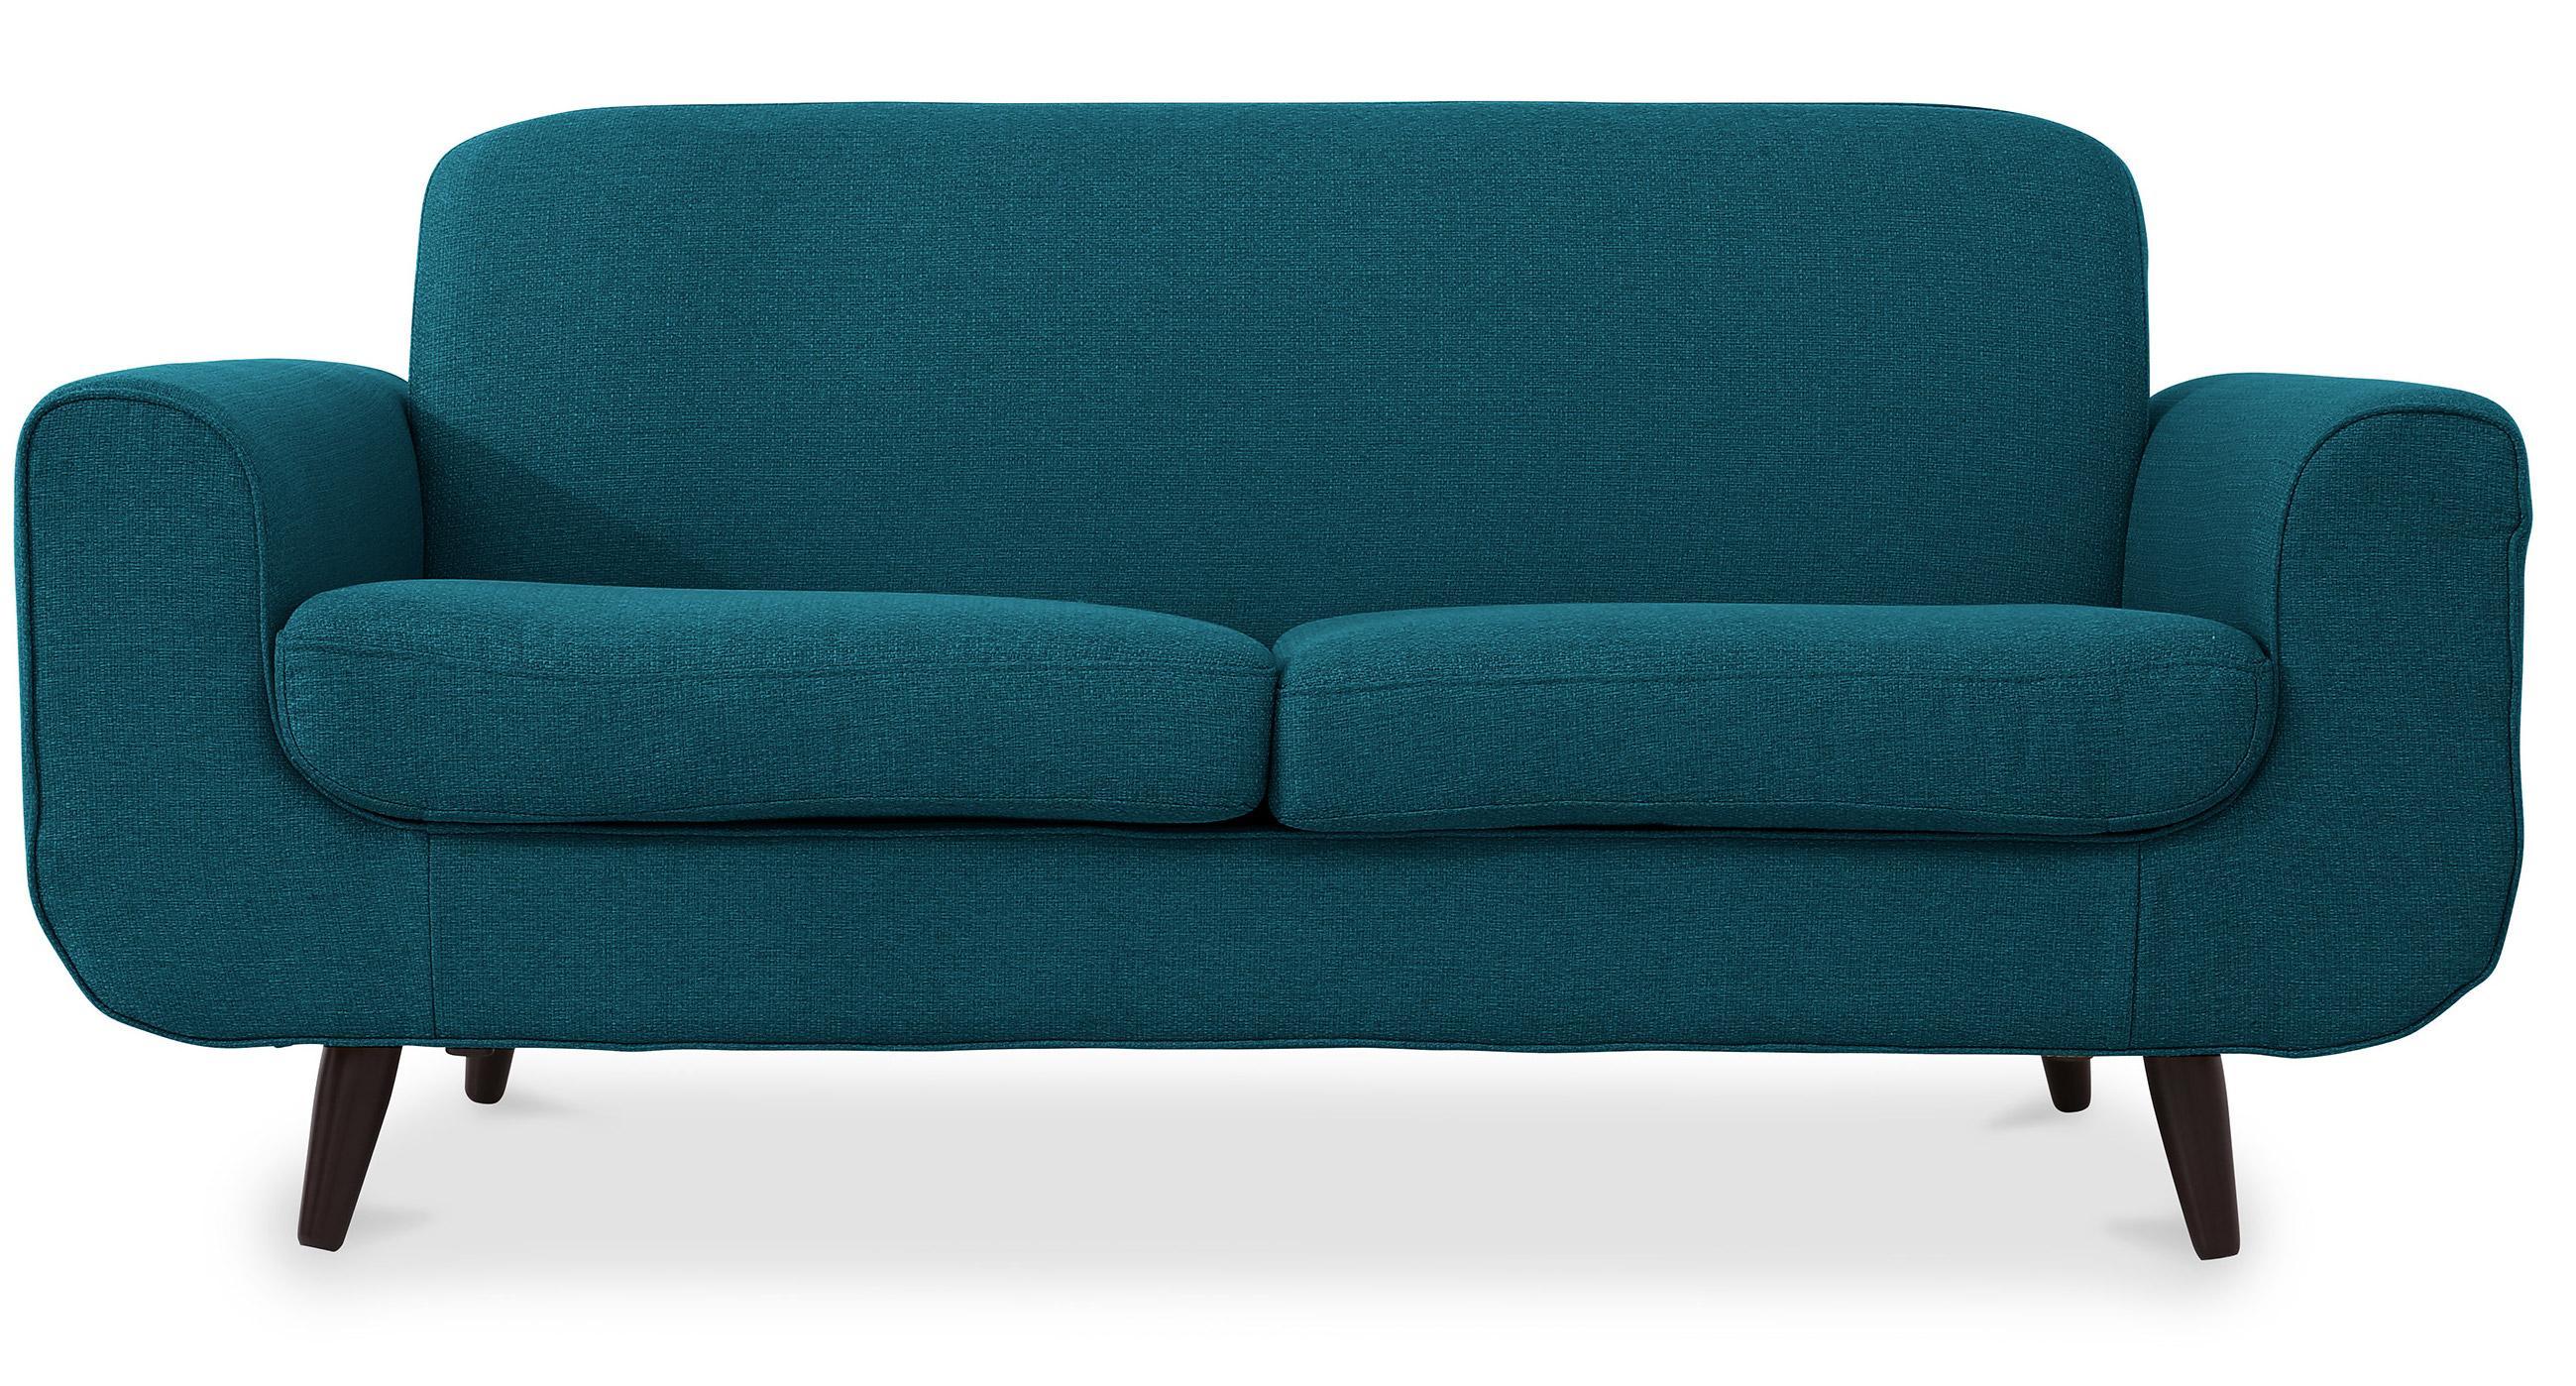 canap 2 places scandinave tissu bleu diane. Black Bedroom Furniture Sets. Home Design Ideas